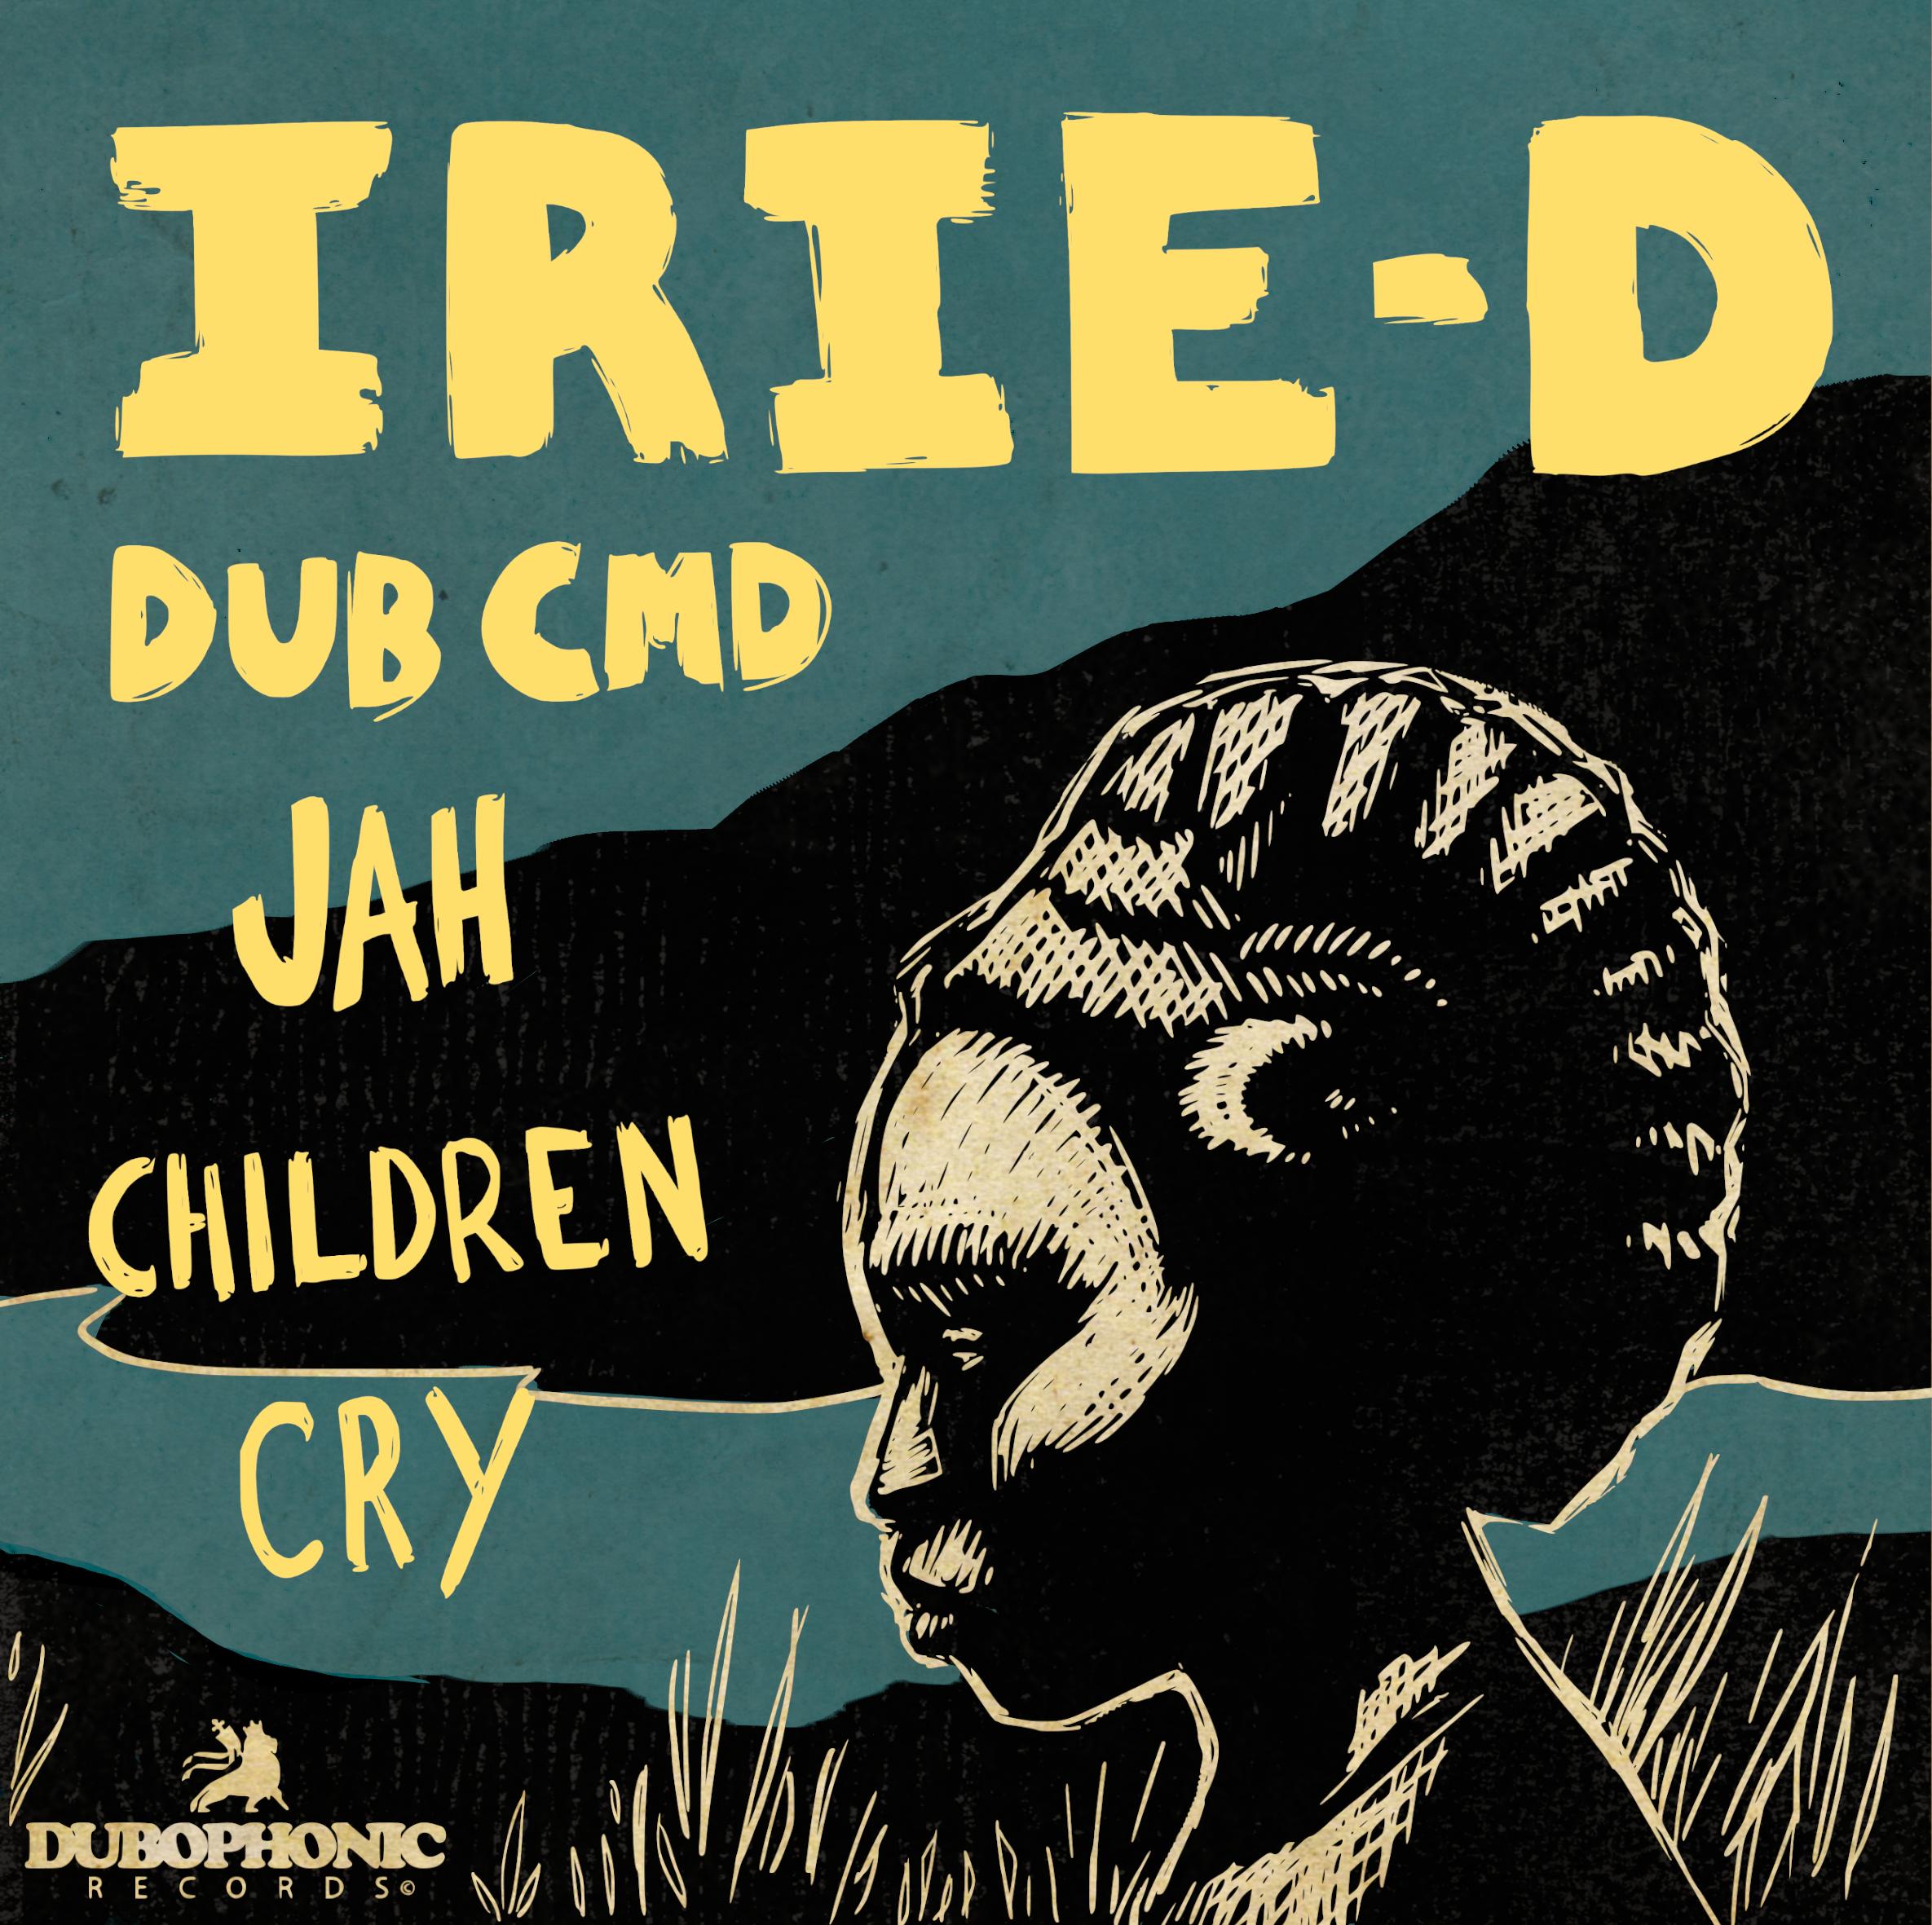 Dub Cmd Irie D Jah Children Cry